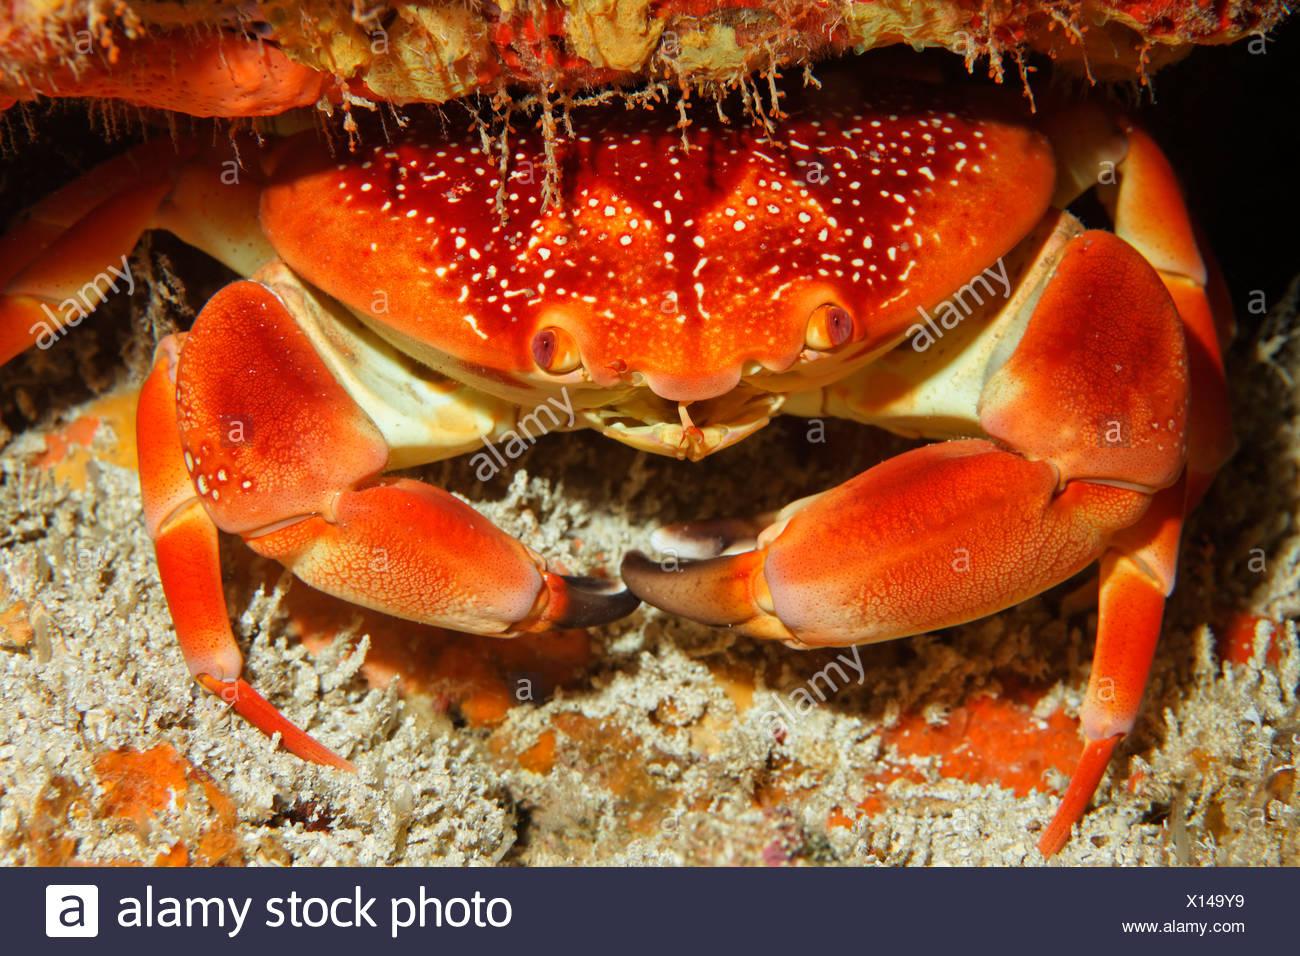 Batwing Coral Crab (Carpilius corallinus), Little Tobago, Speyside, Trinidad and Tobago, Lesser Antilles, Caribbean Sea - Stock Image